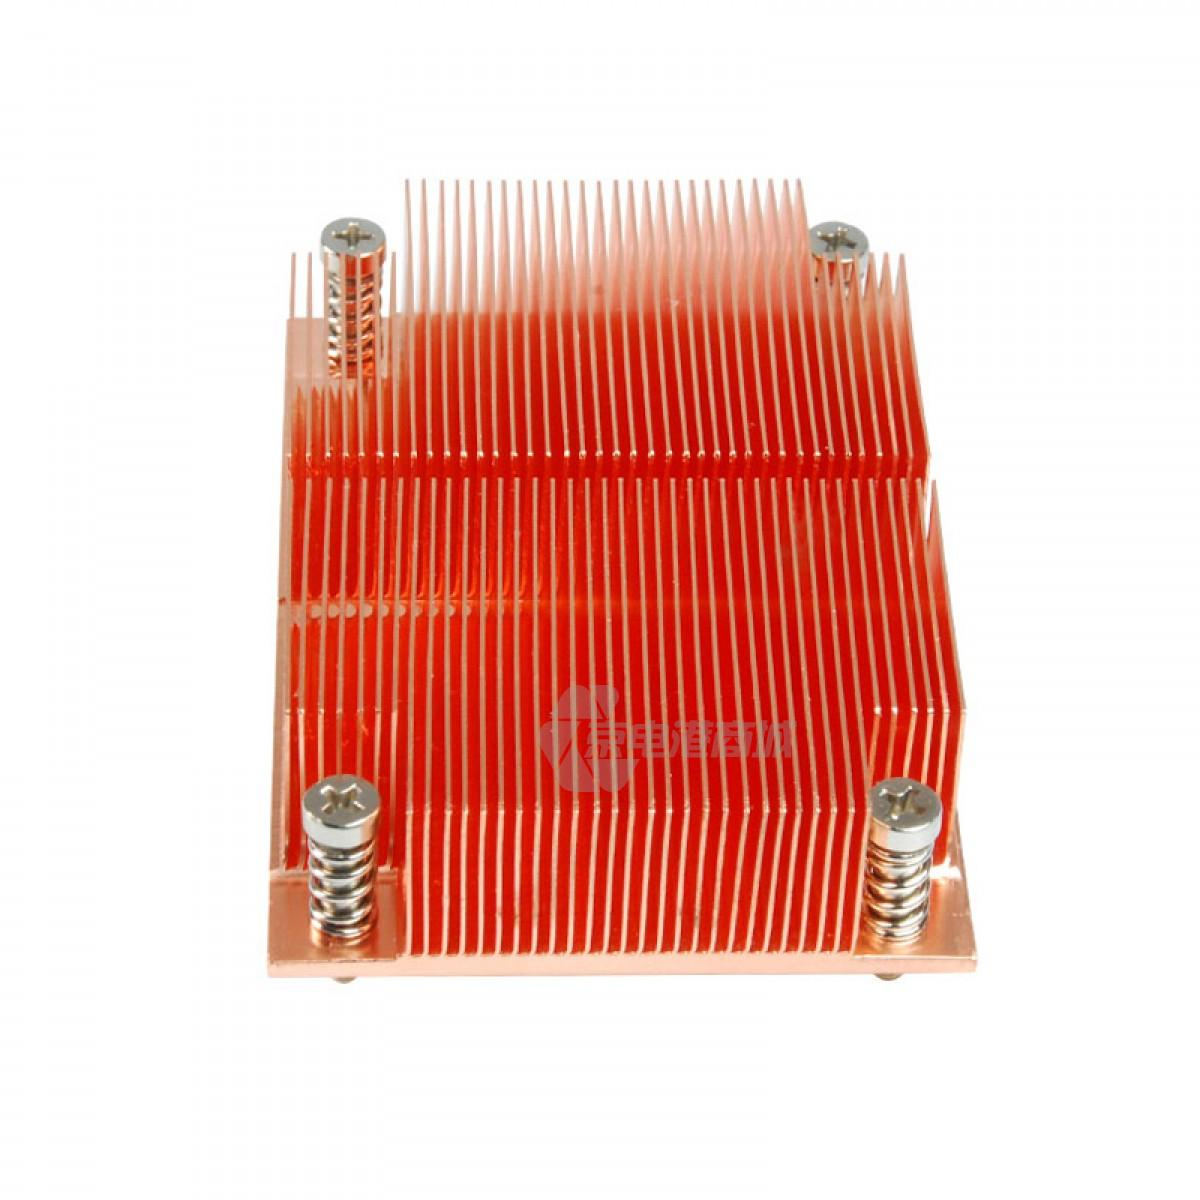 EVERCOOL LGAL2011B(N) 106x72x23.5mm SERVER COOLER